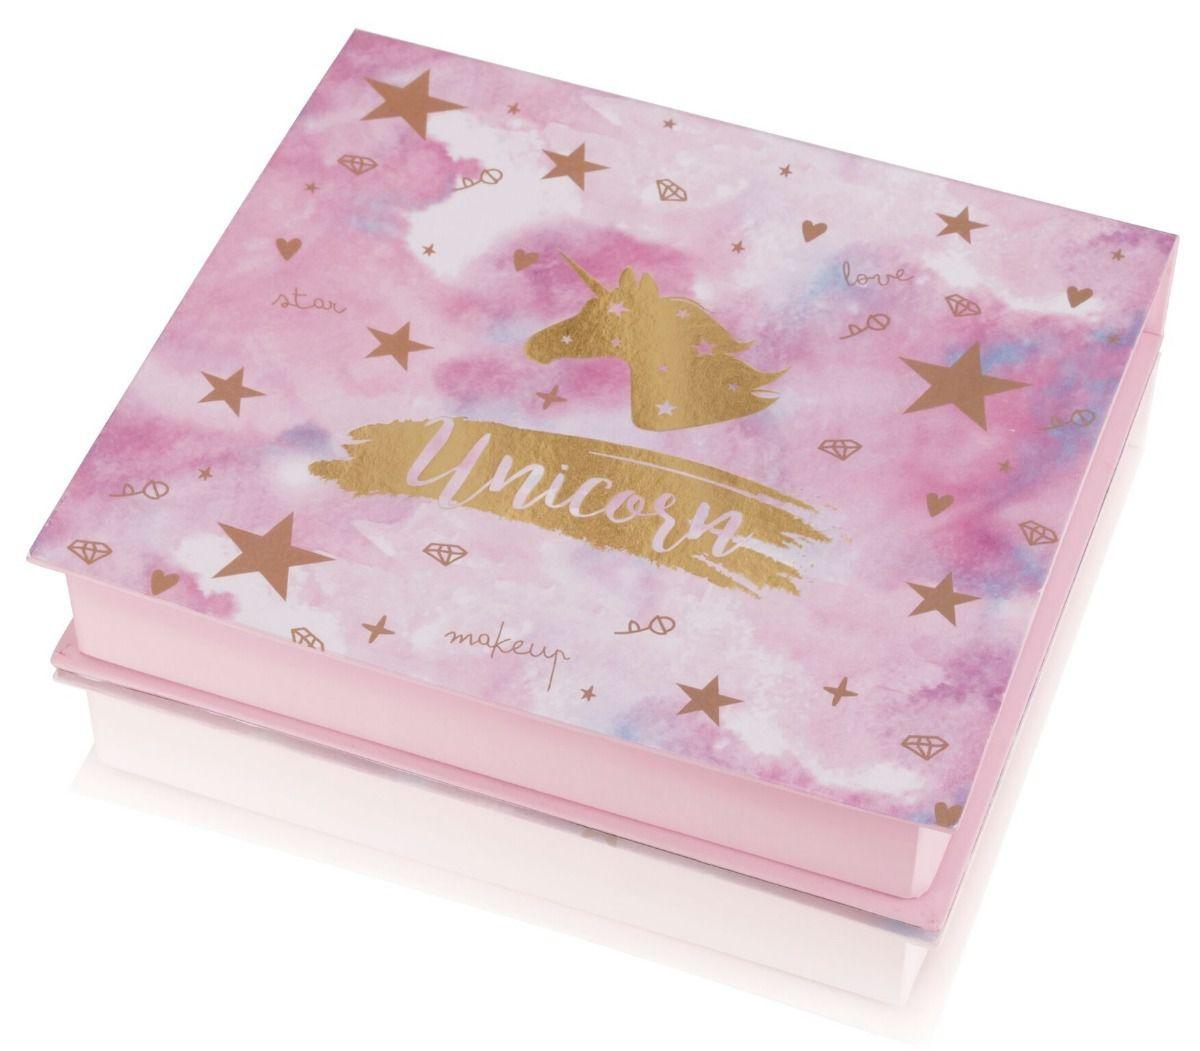 Kit Maquiagem Magia Do Unicórnio - Mahav